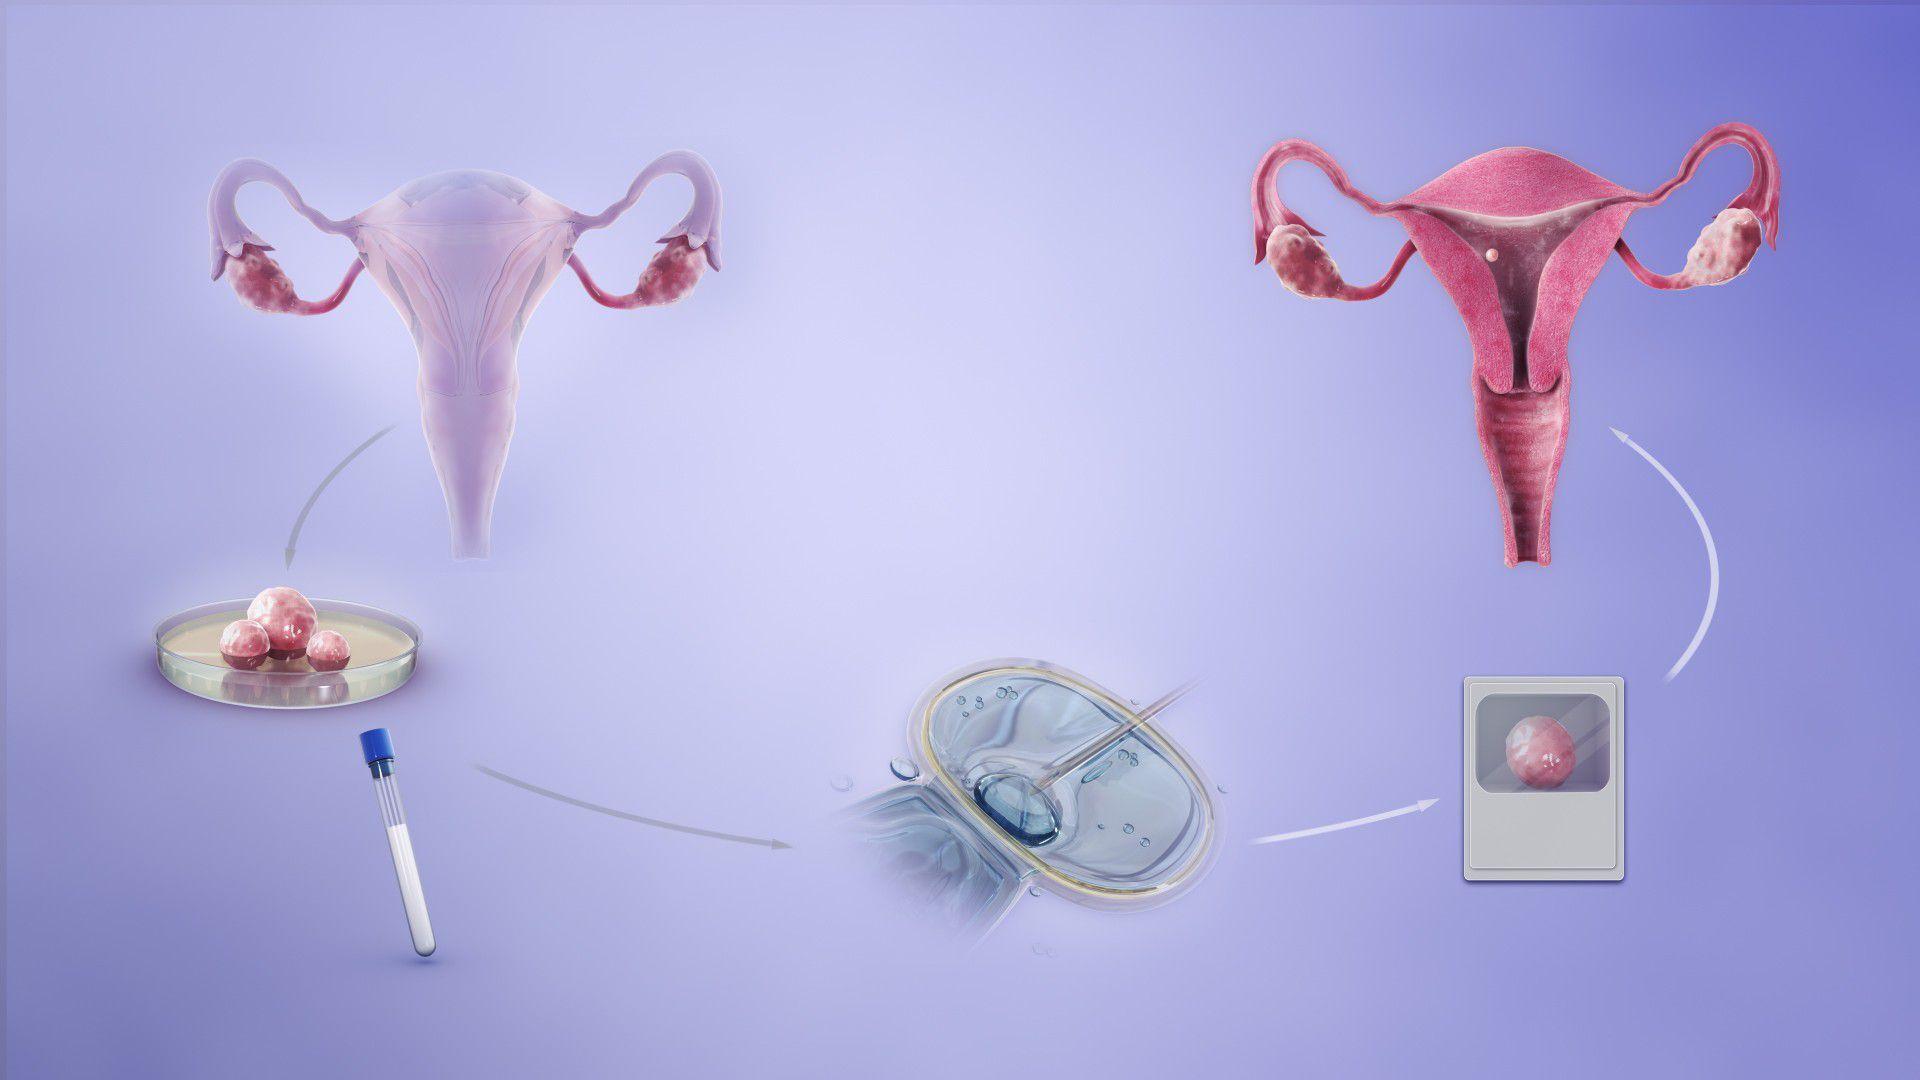 embriyo bağlama, hamile kalma, embriyo bağlama ile hamile kalma